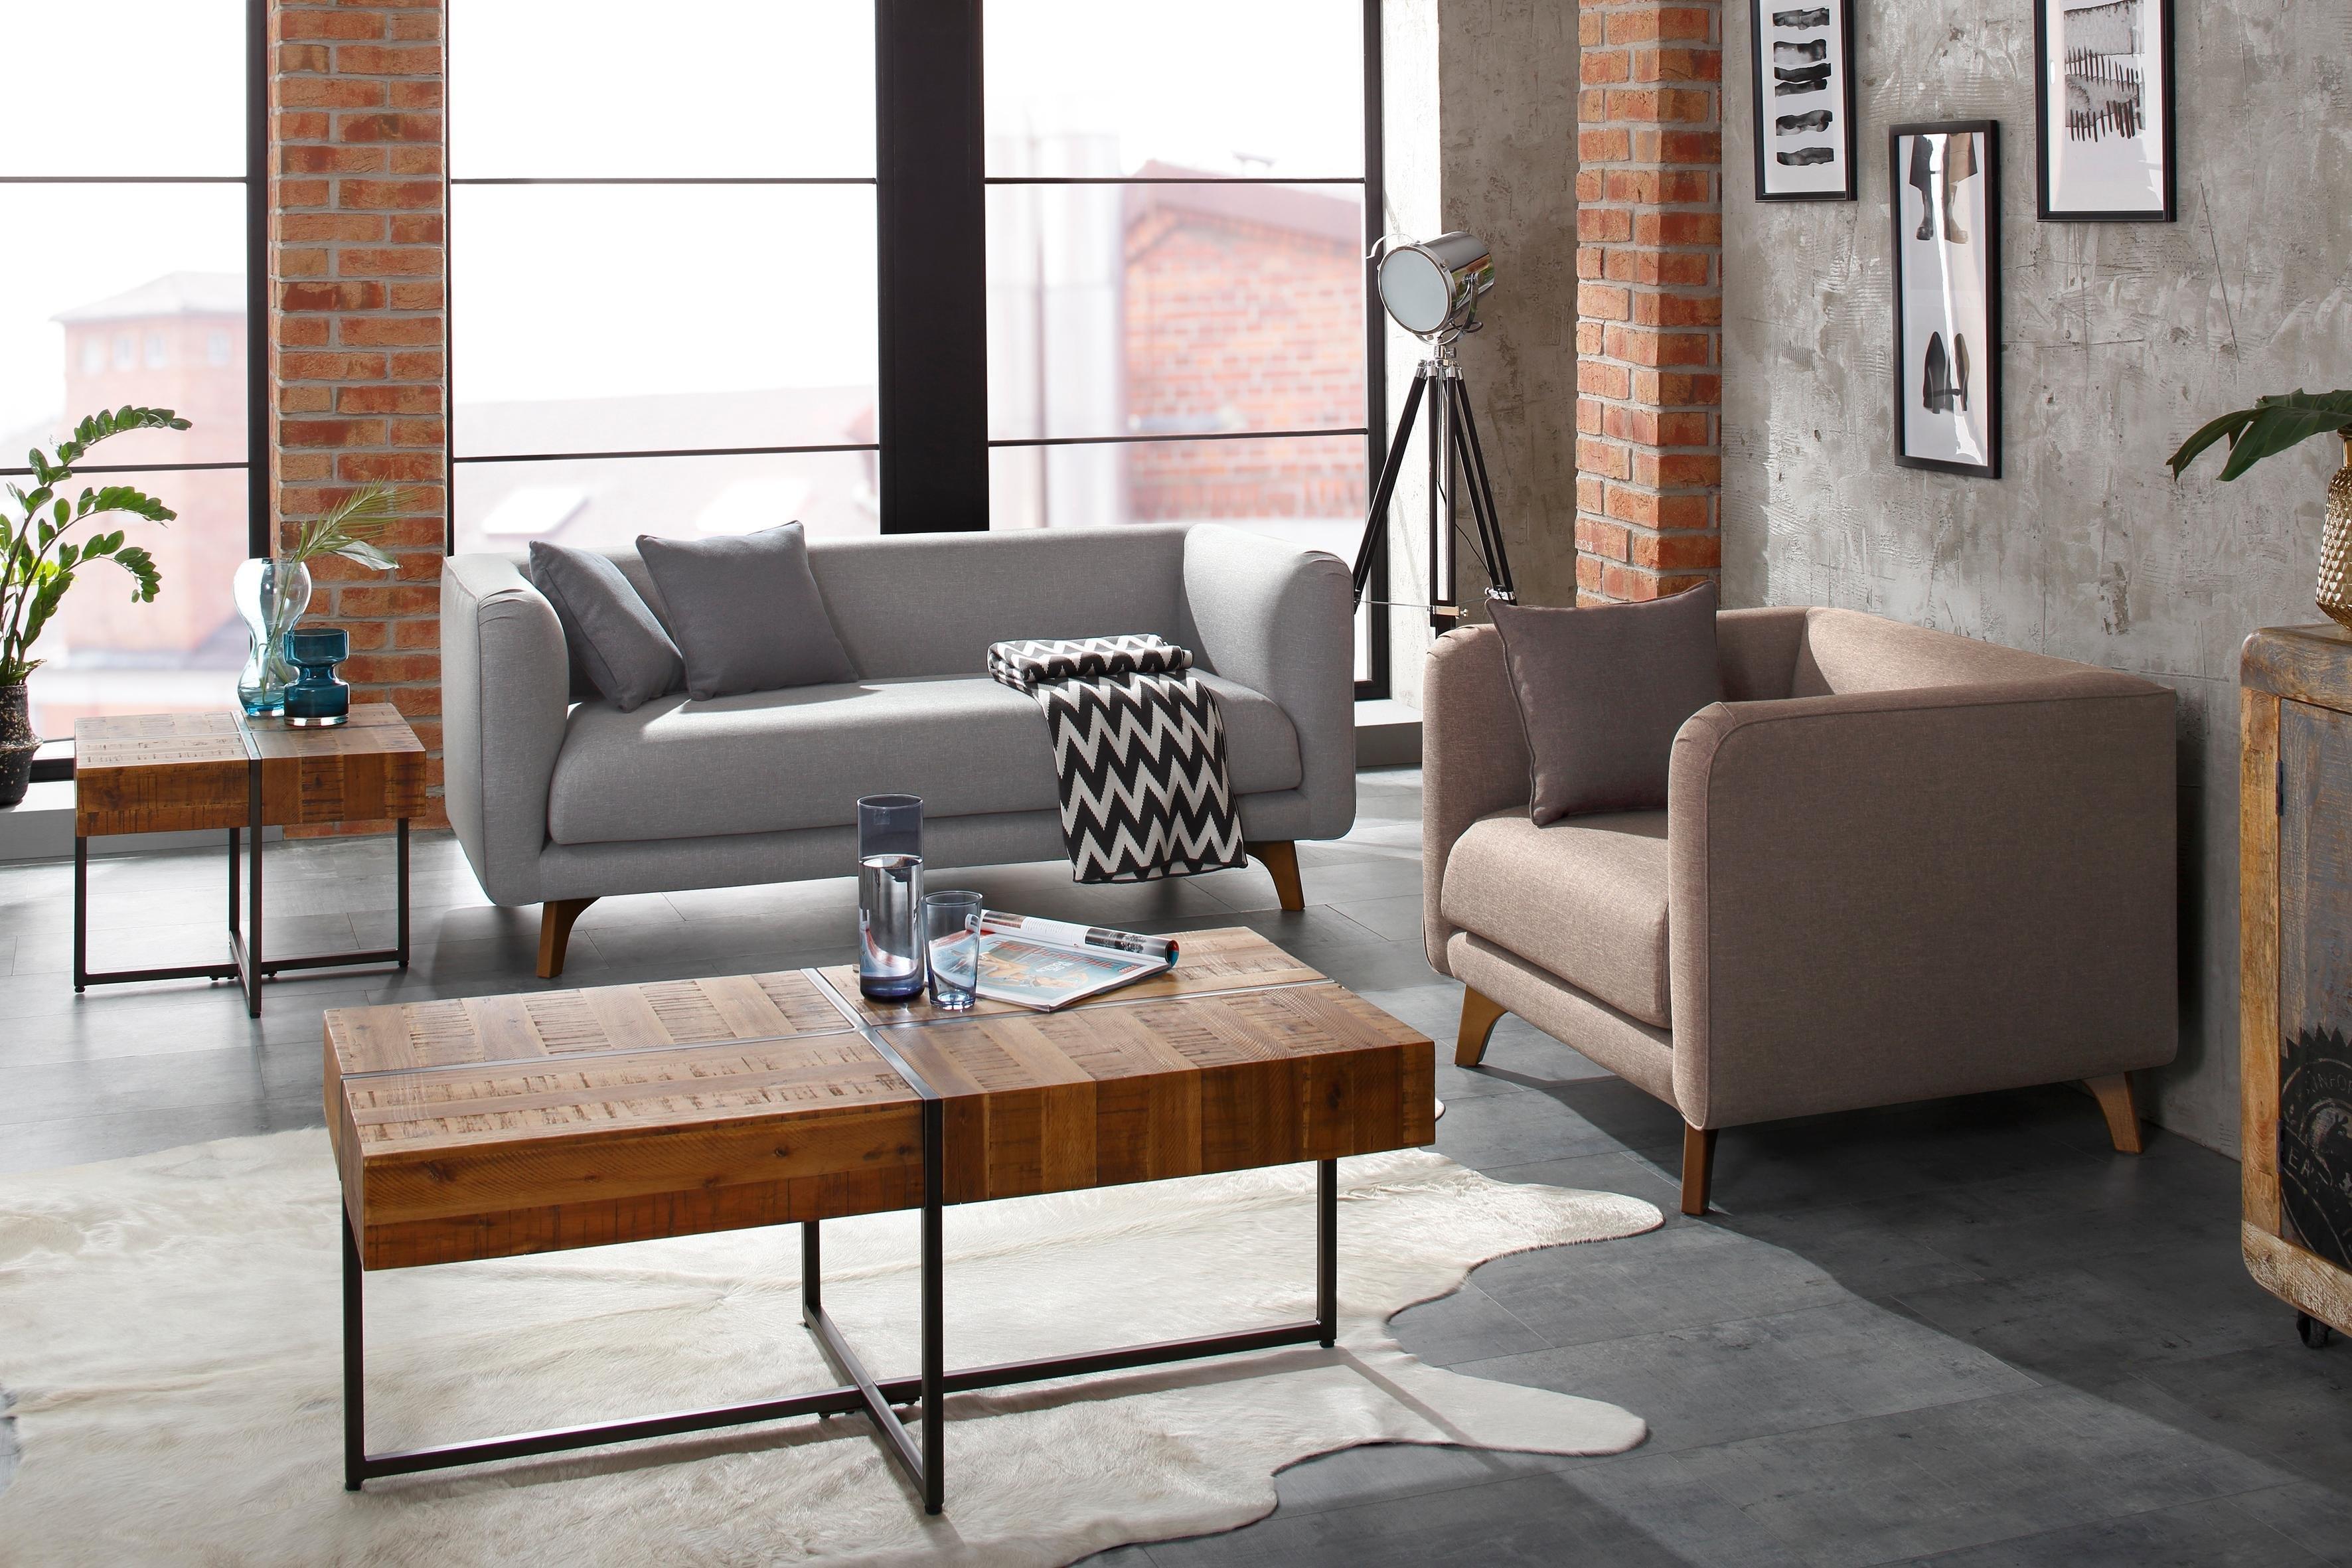 Home affaire salontafel Marilyn Tafelblad 120x60 cm, in industrial-look - verschillende betaalmethodes